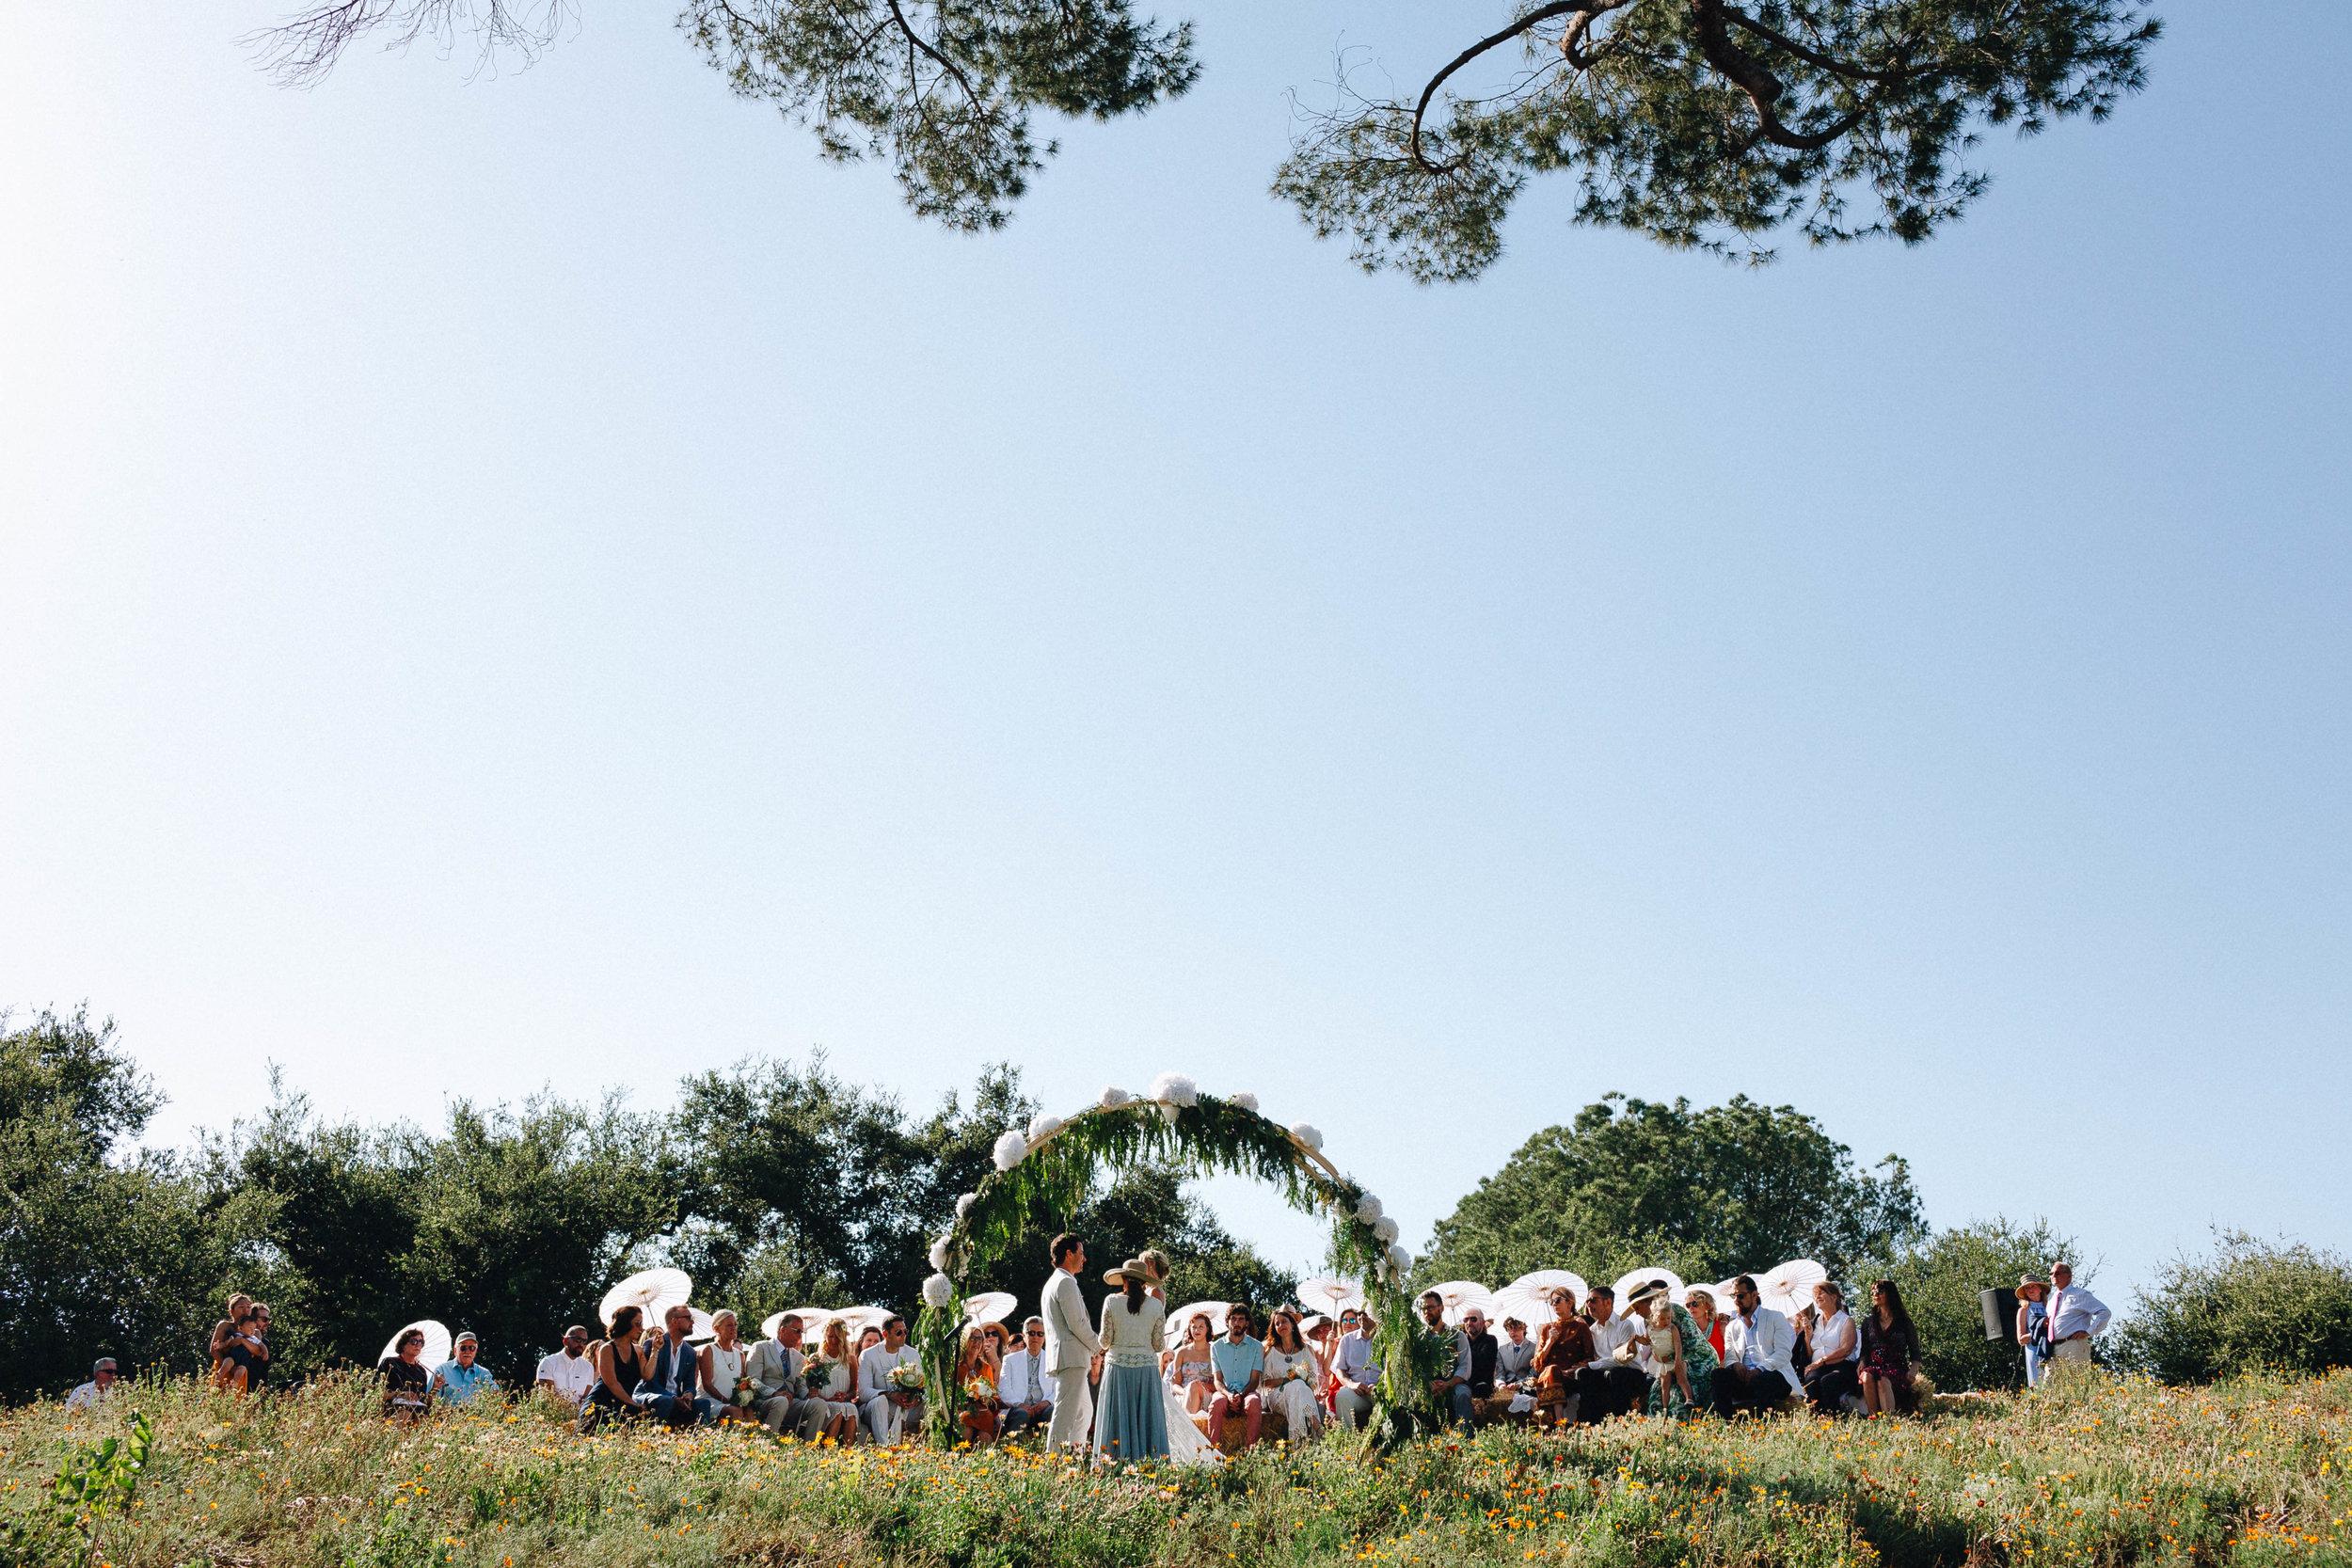 Whitney-Matt-wedding-Two Penguin Photography - Forage Ojai-137A0044.jpg